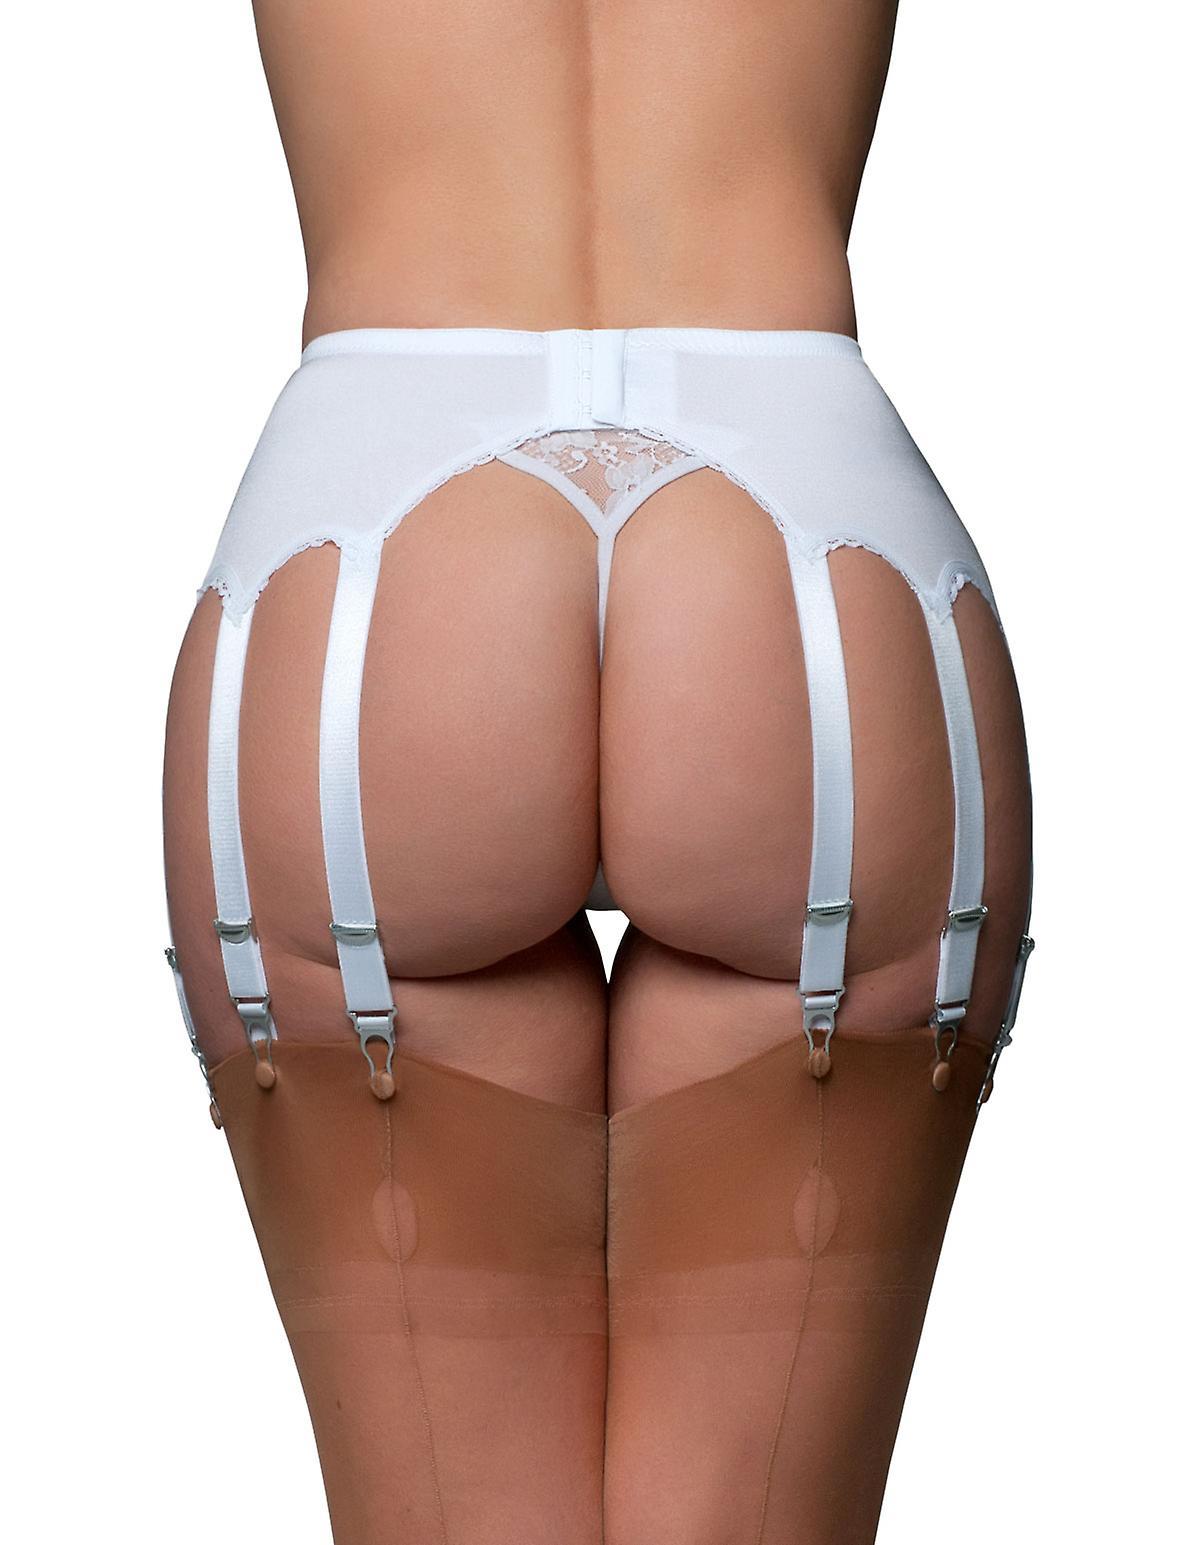 Nylon Dreams NDL13 Women's Garter Belt 12 Strap Suspender Belt